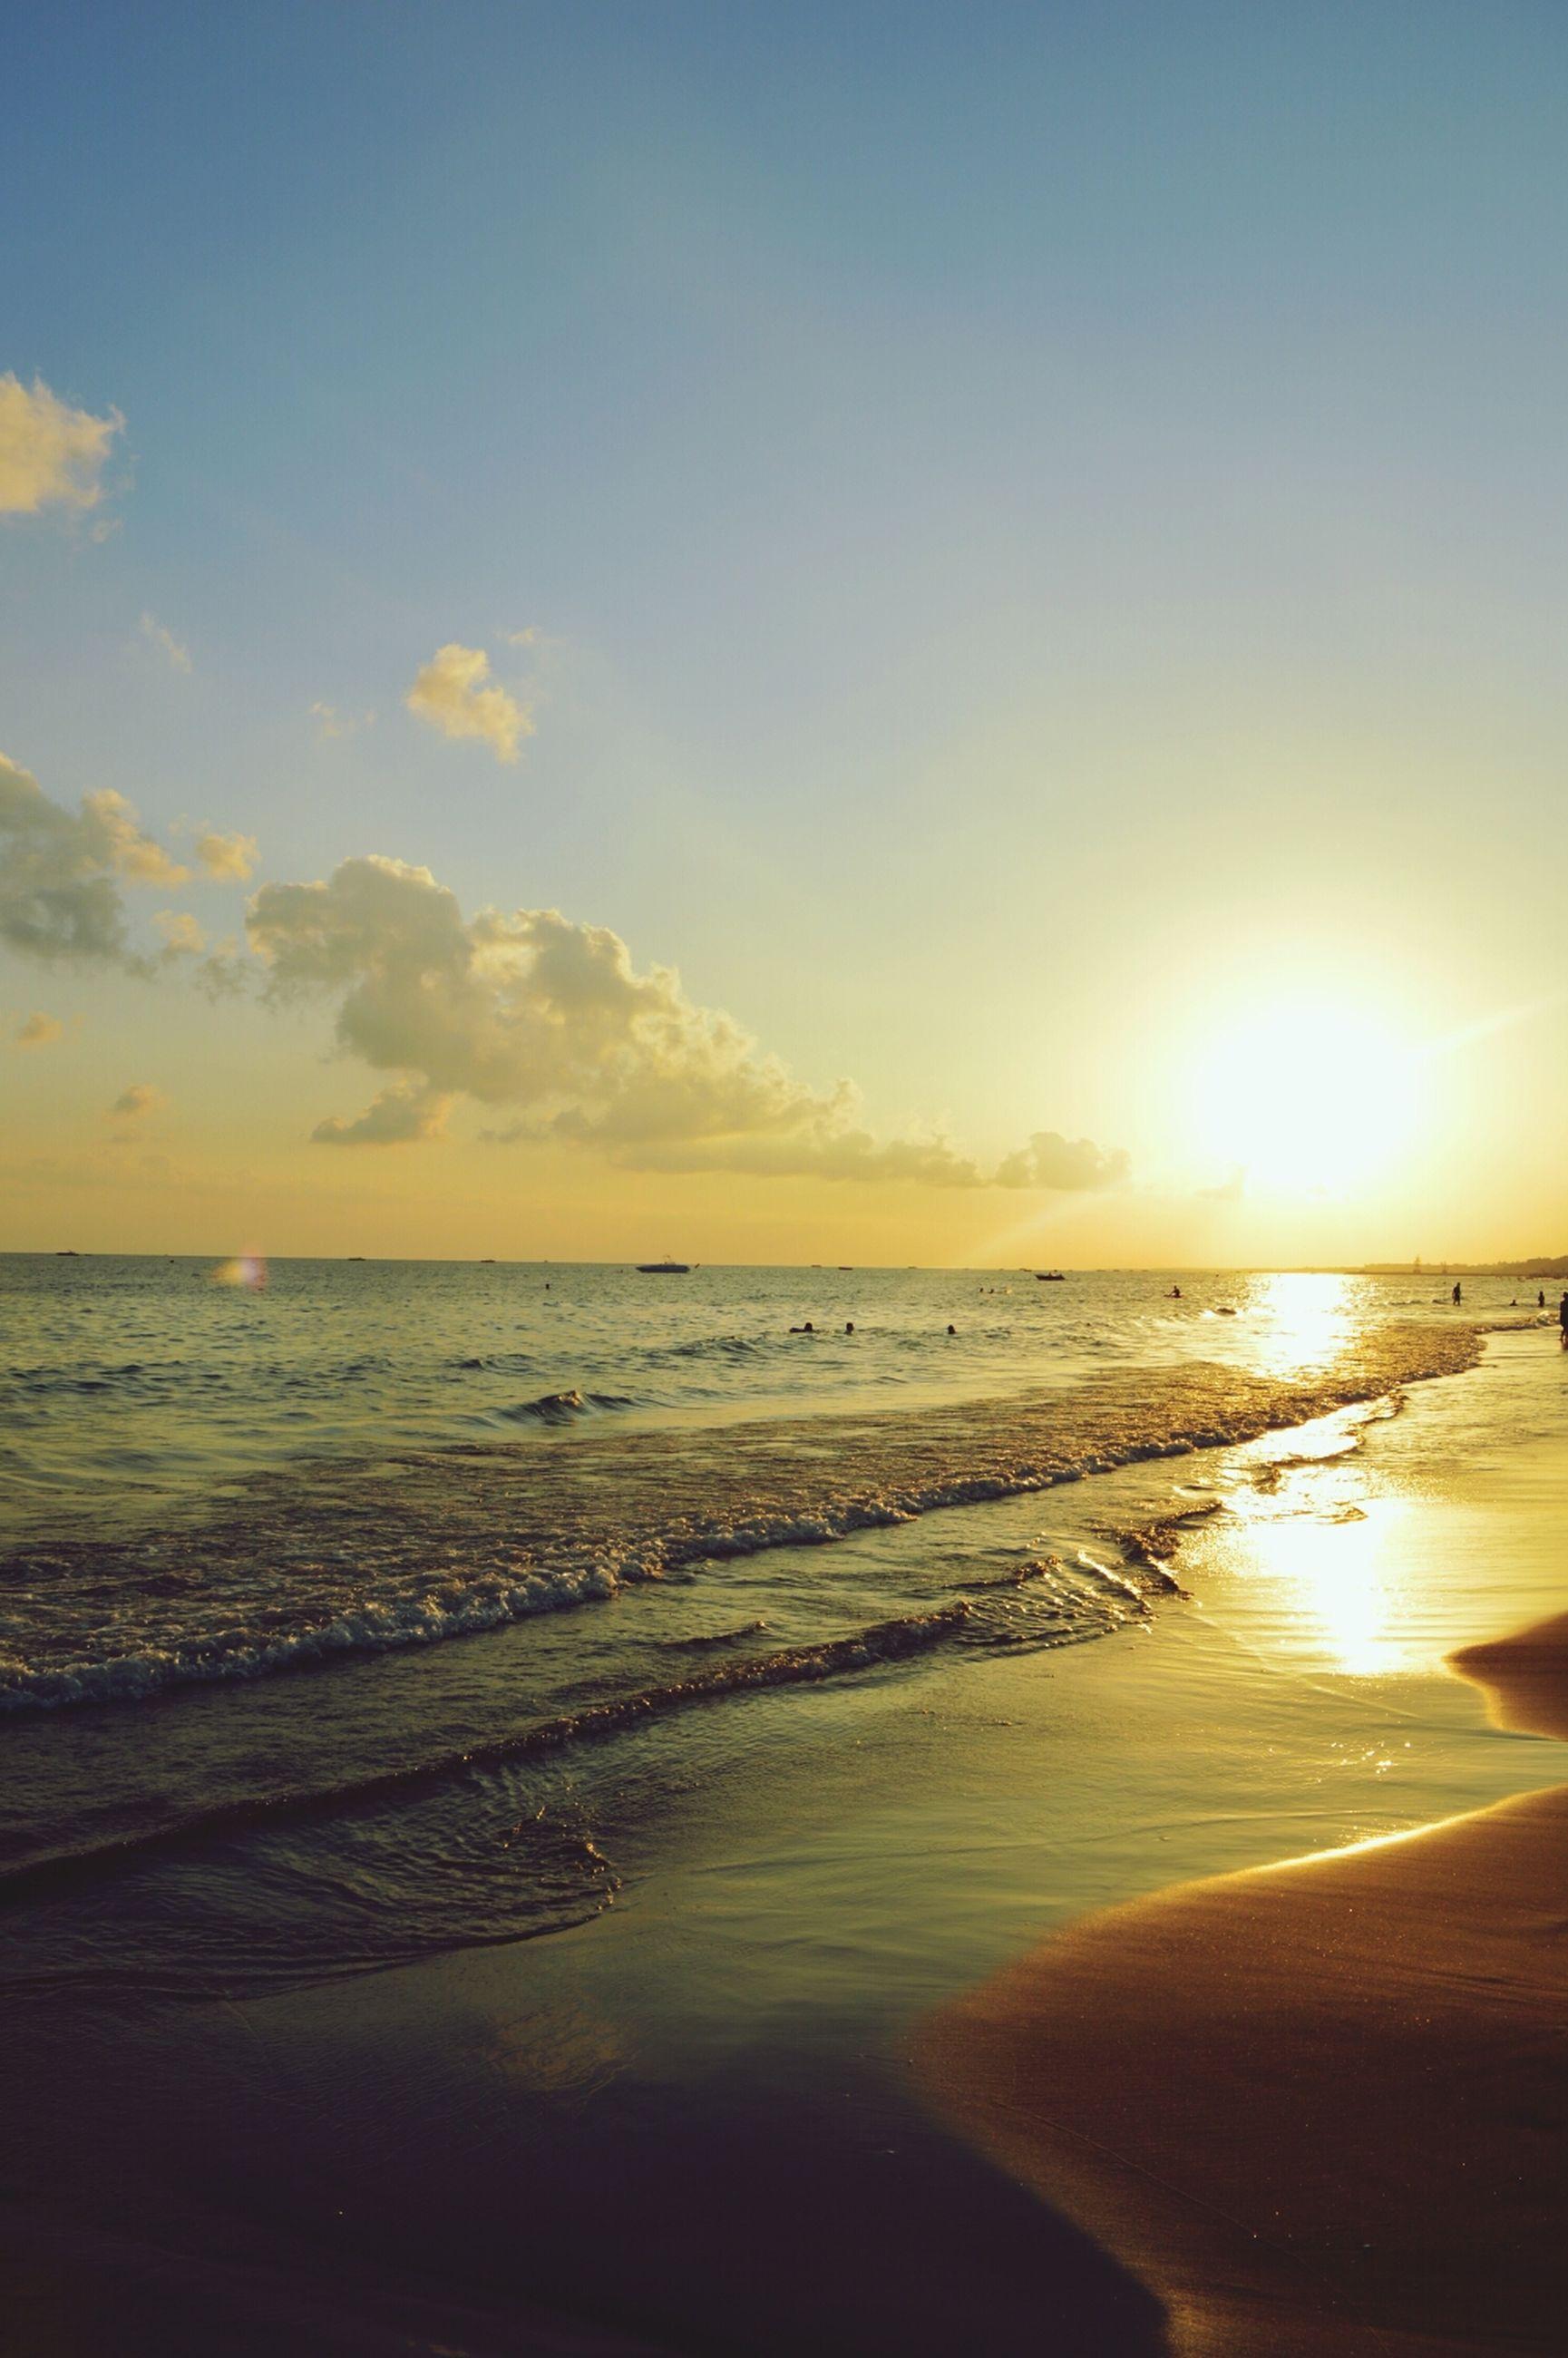 sunset, sea, beach, water, horizon over water, sun, scenics, tranquil scene, beauty in nature, tranquility, shore, sky, nature, orange color, idyllic, sunlight, sand, reflection, coastline, outdoors